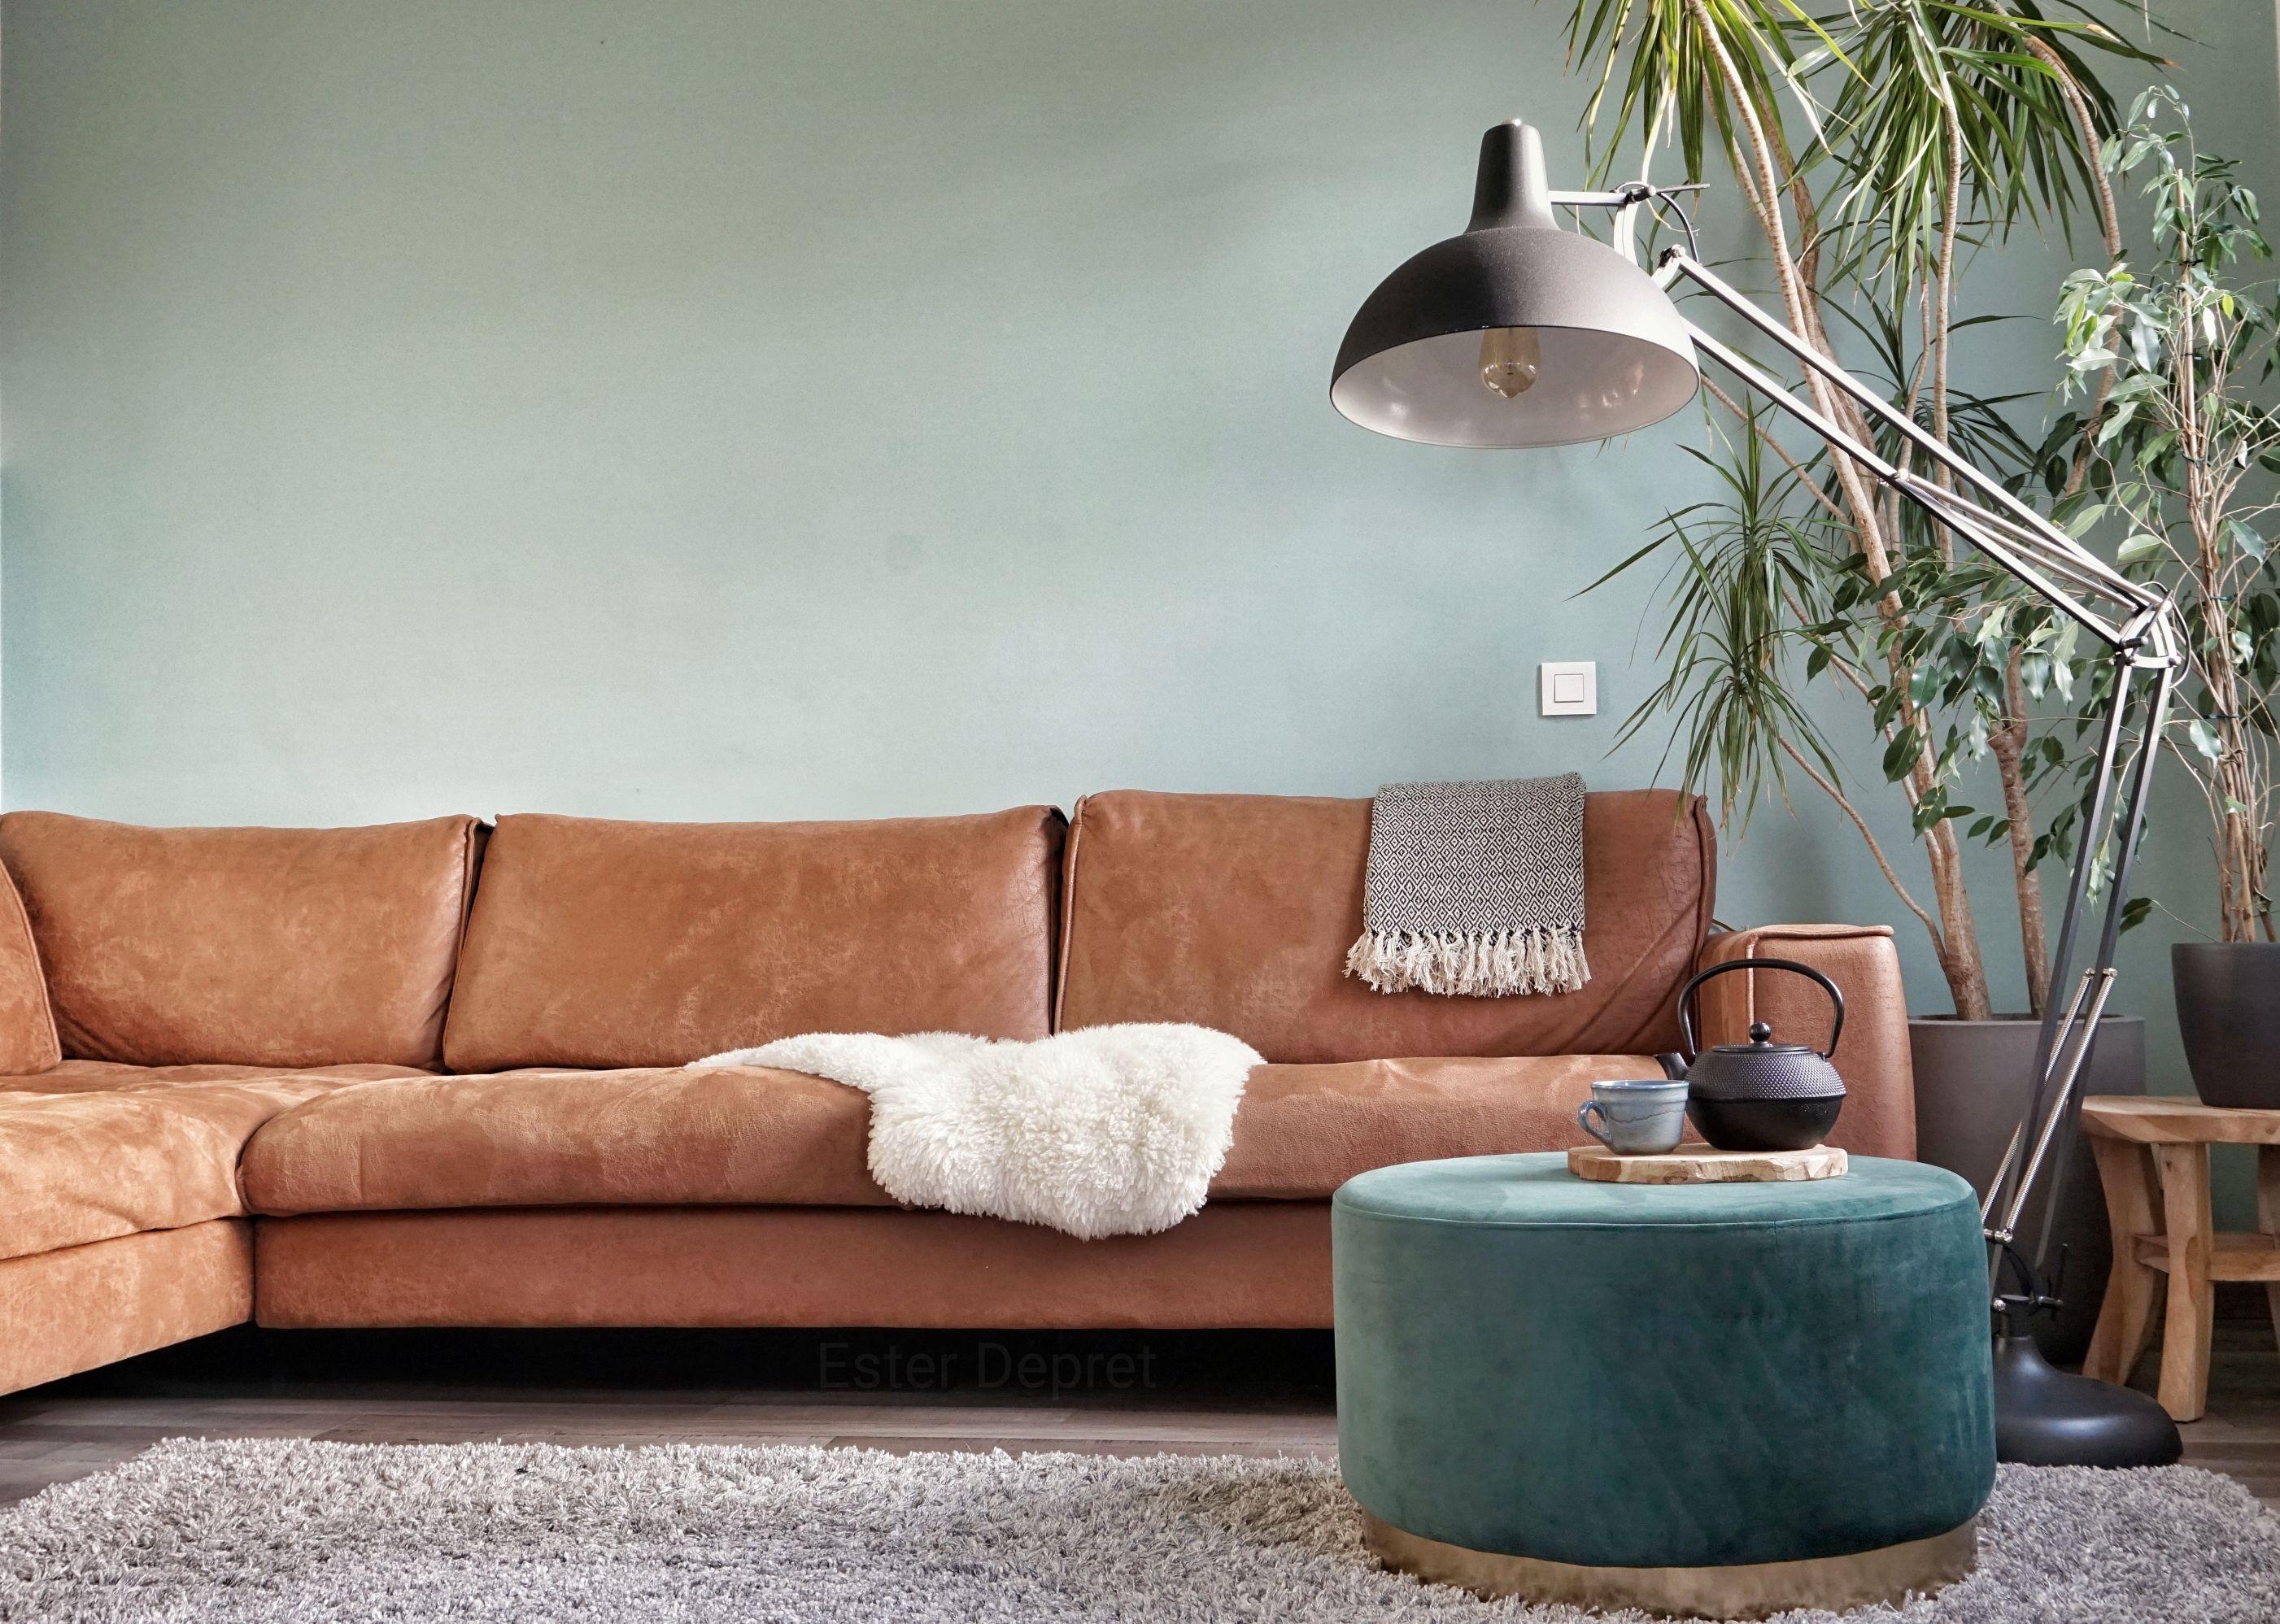 Photo of Warm interior cognac leather sofa